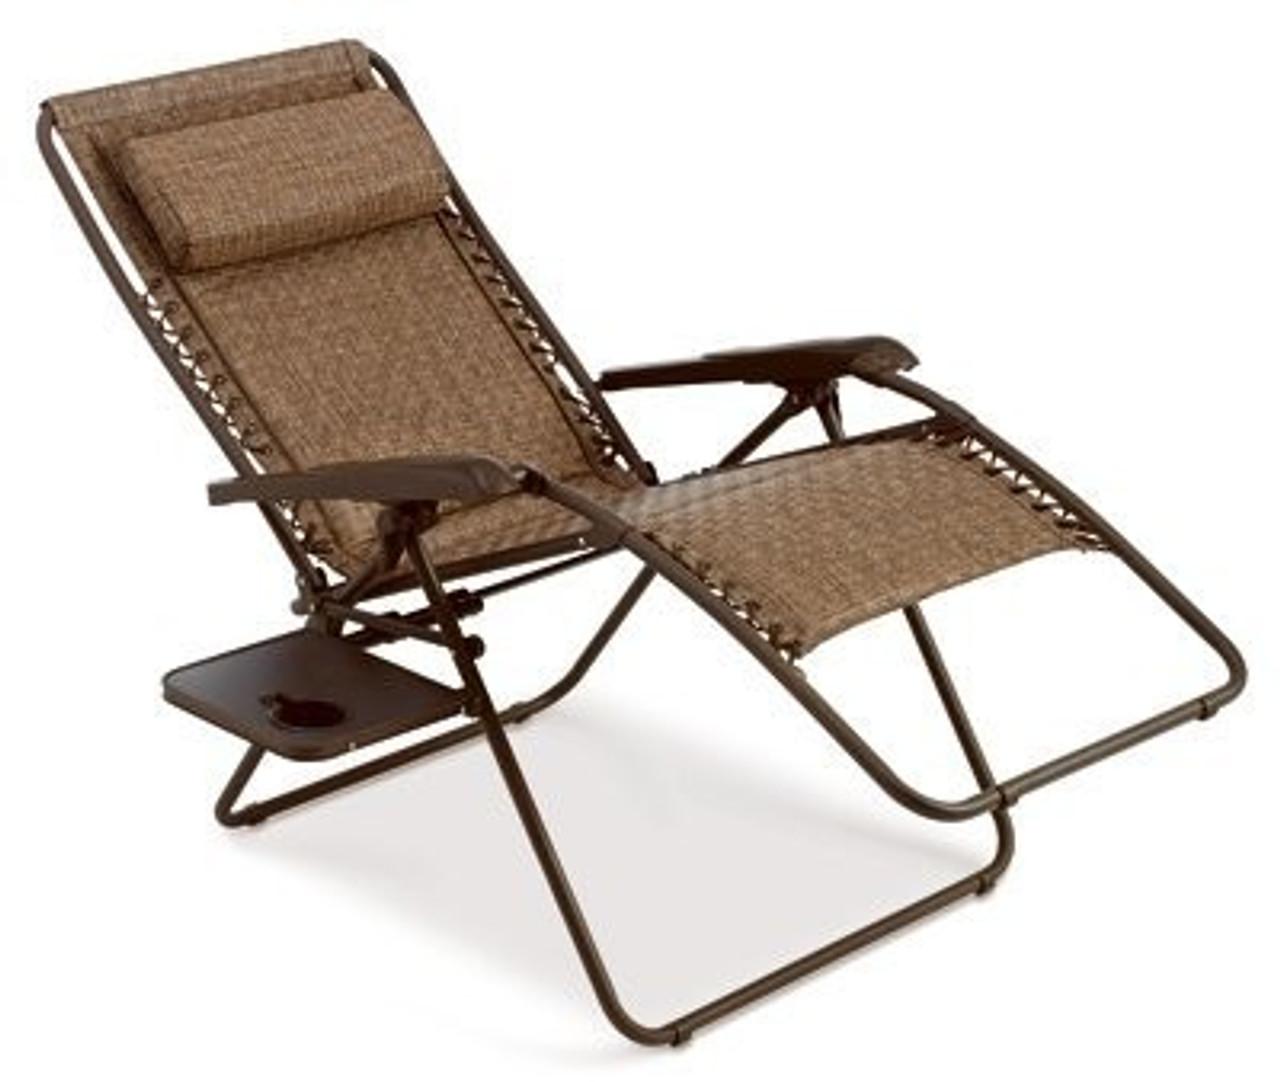 Woodard cm RXTV-1825-XL-R Woodard Zero Gravity Chair